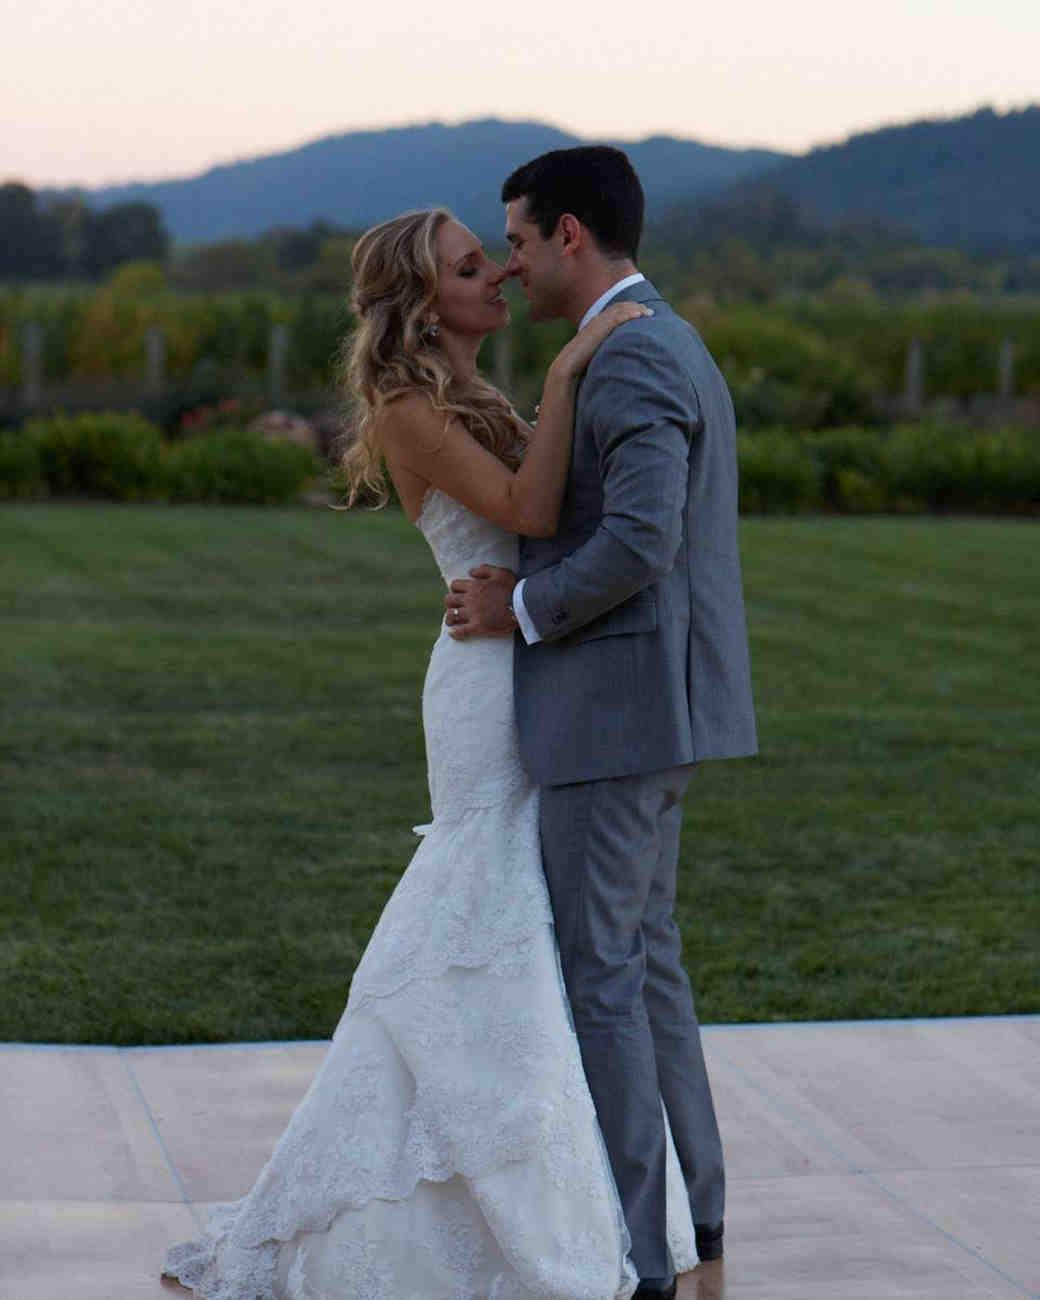 wedding-cover-bands-the-marco-cantarella-band.jpg